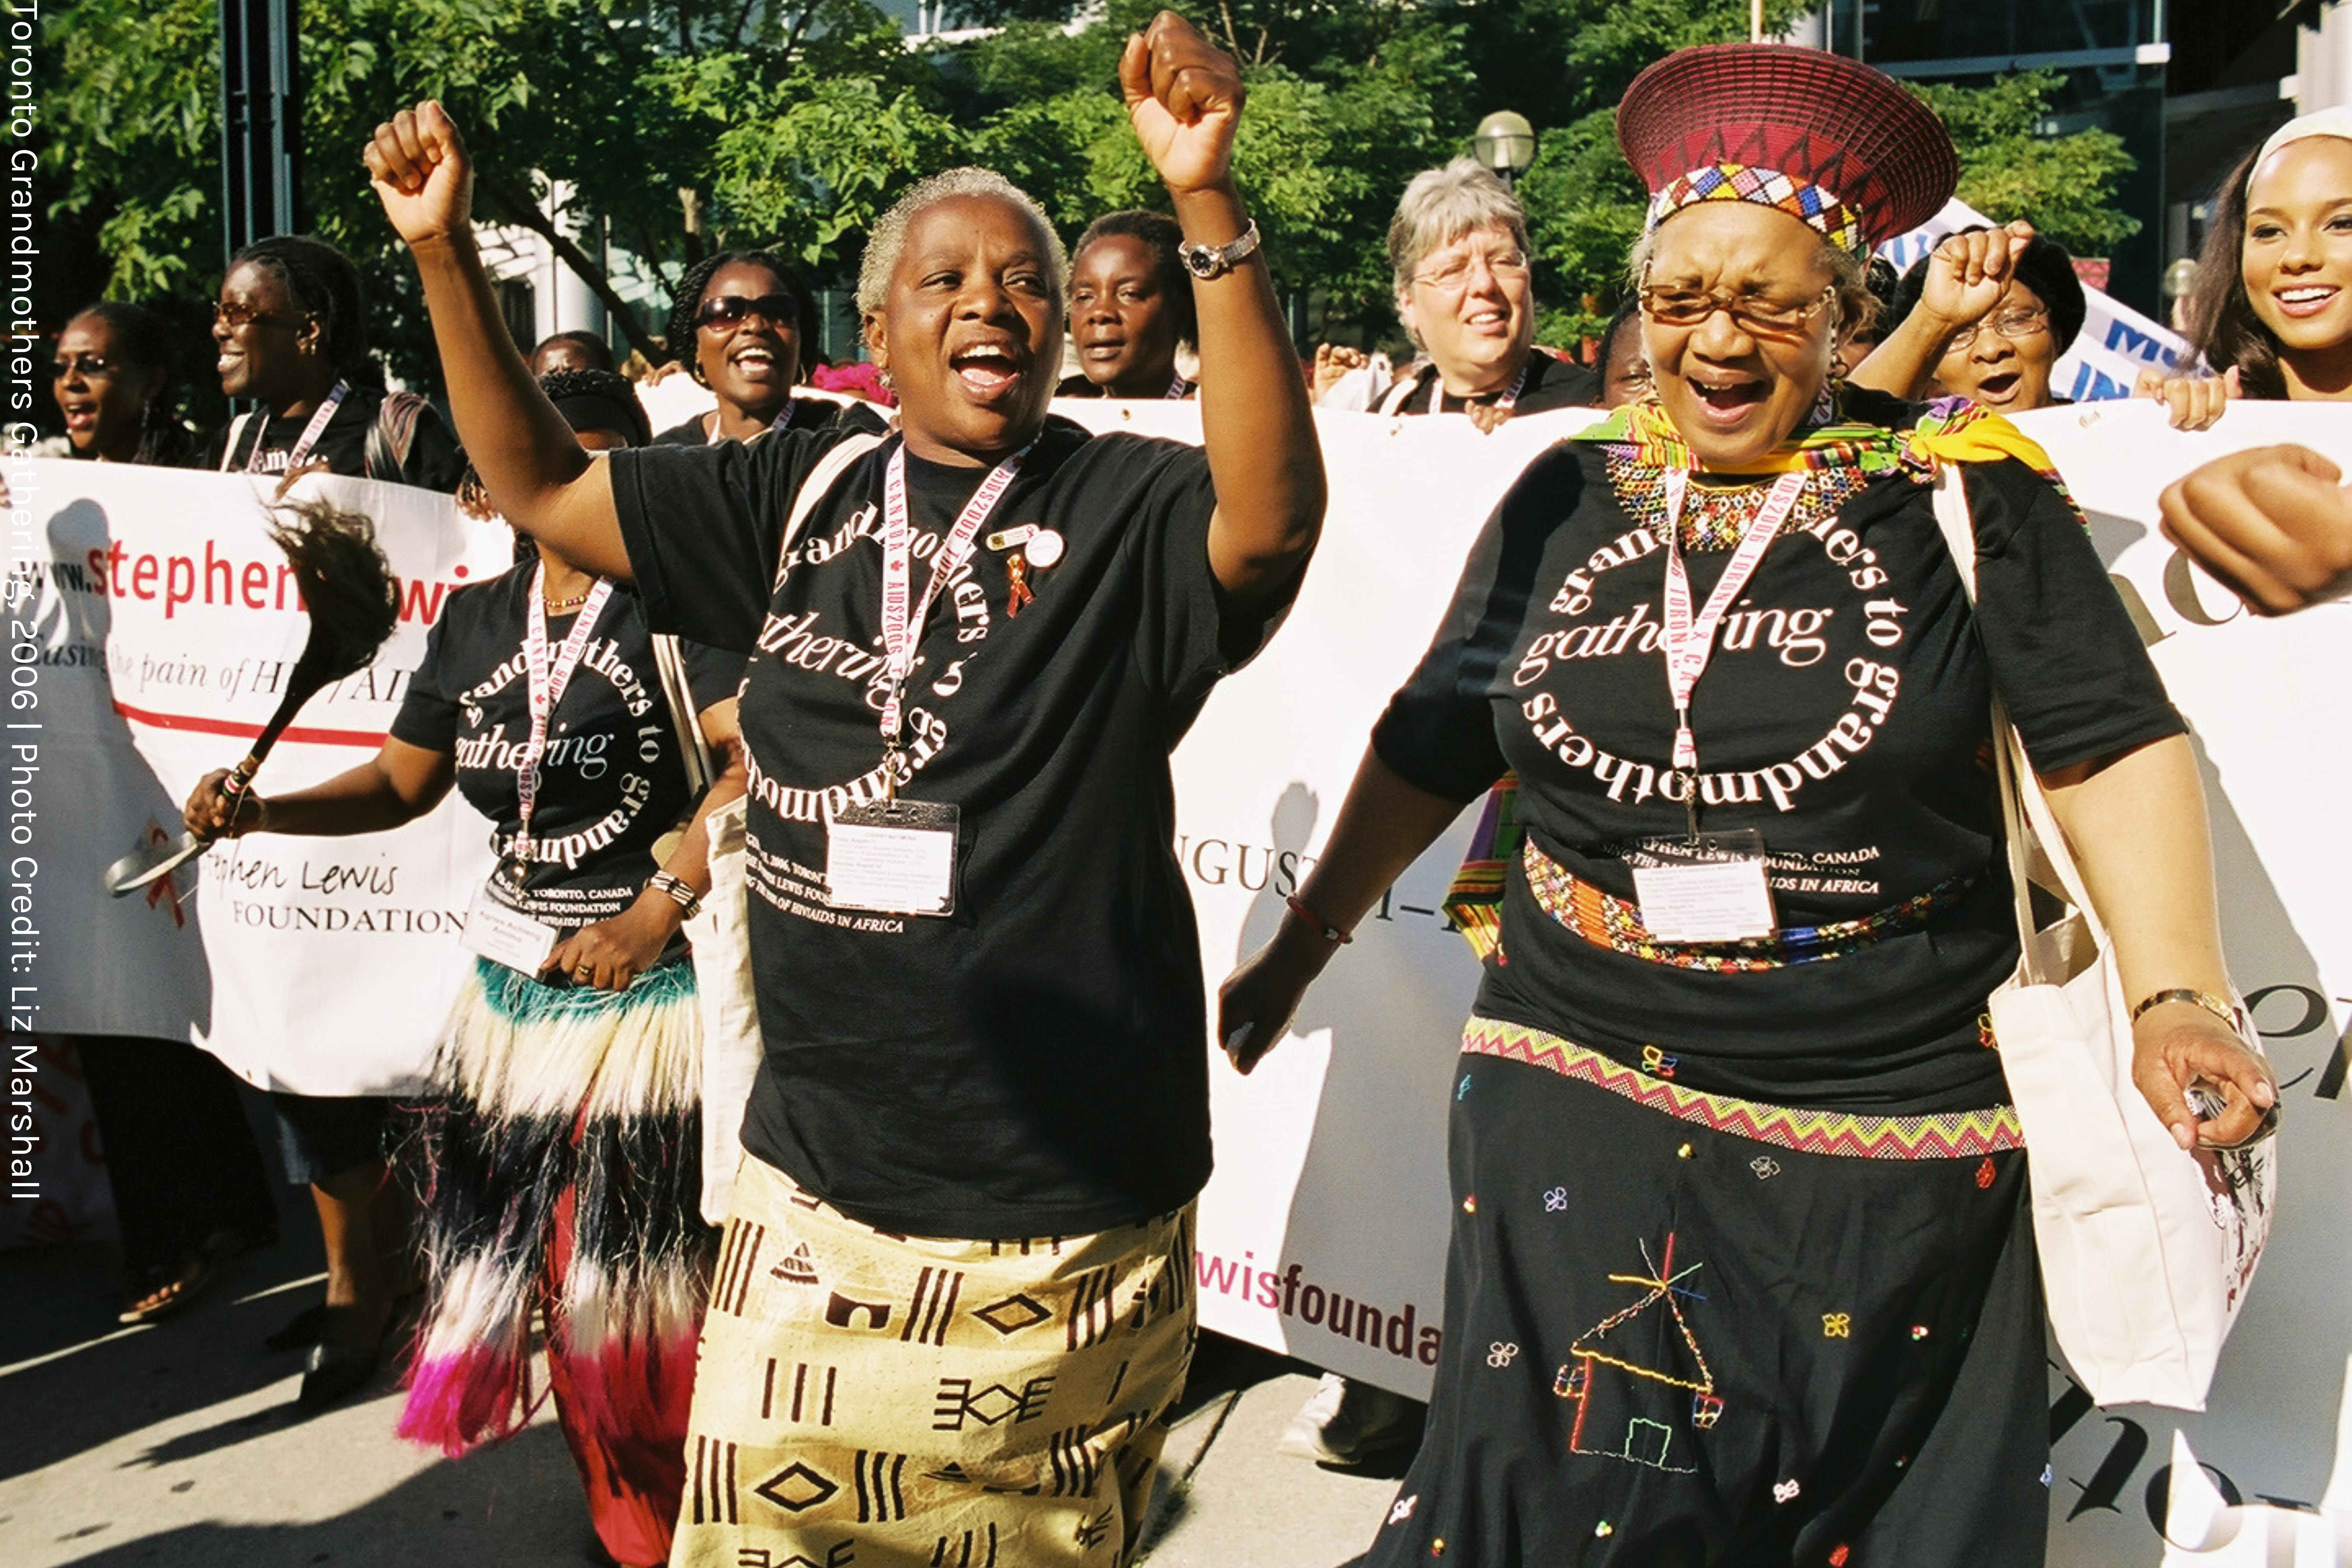 Toronto Grandmothers Gathering, 2006